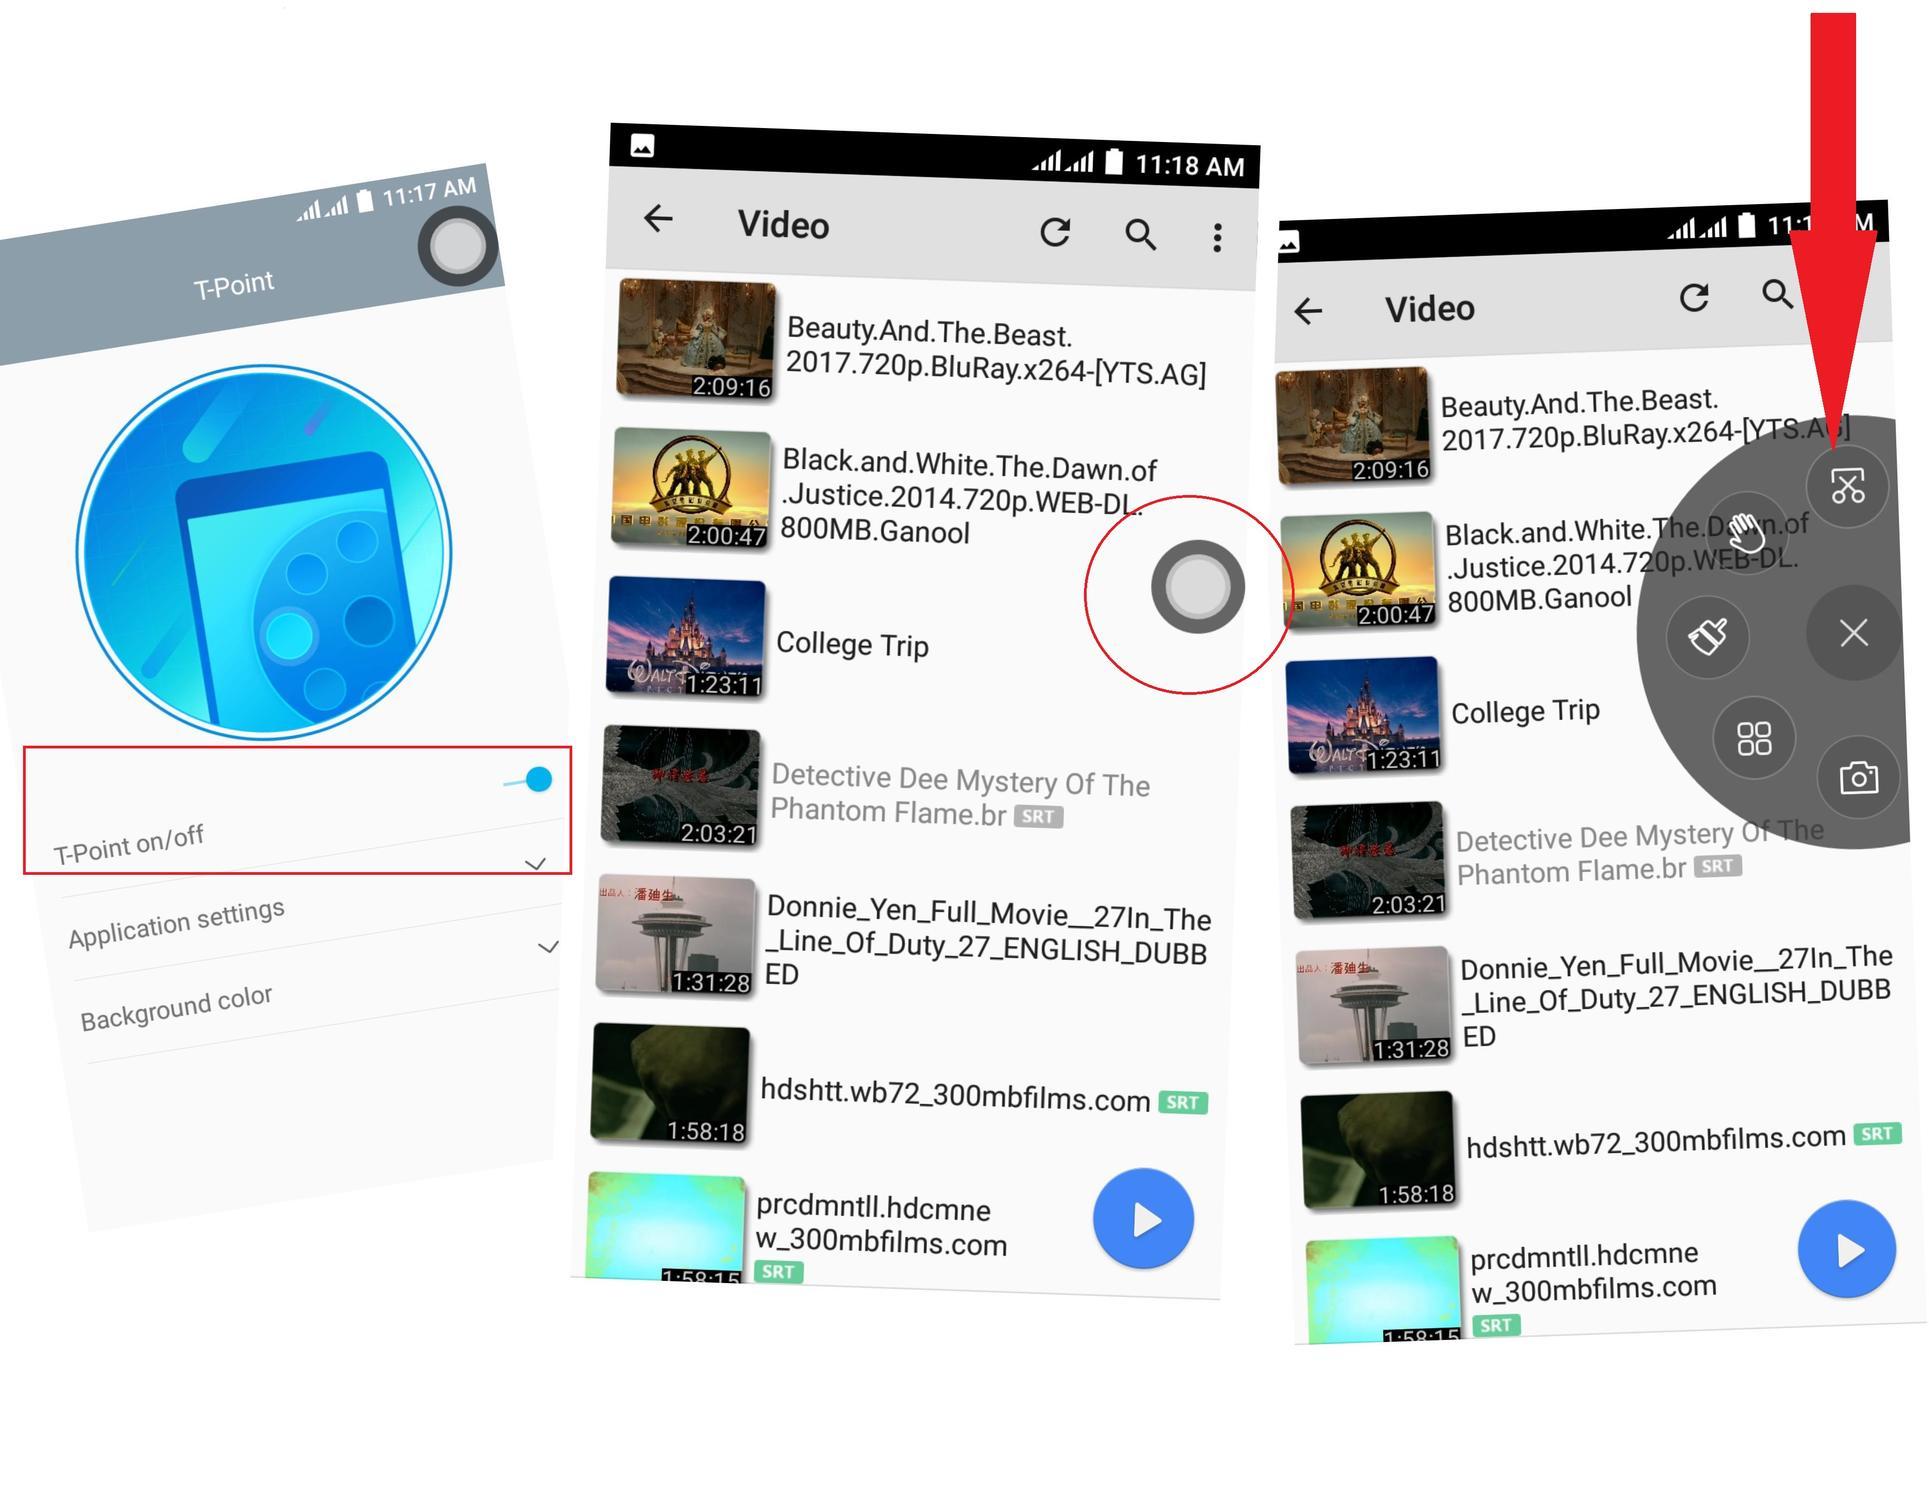 3 Methods to screenshot on your Tecno Spark - TECNO MOBILE